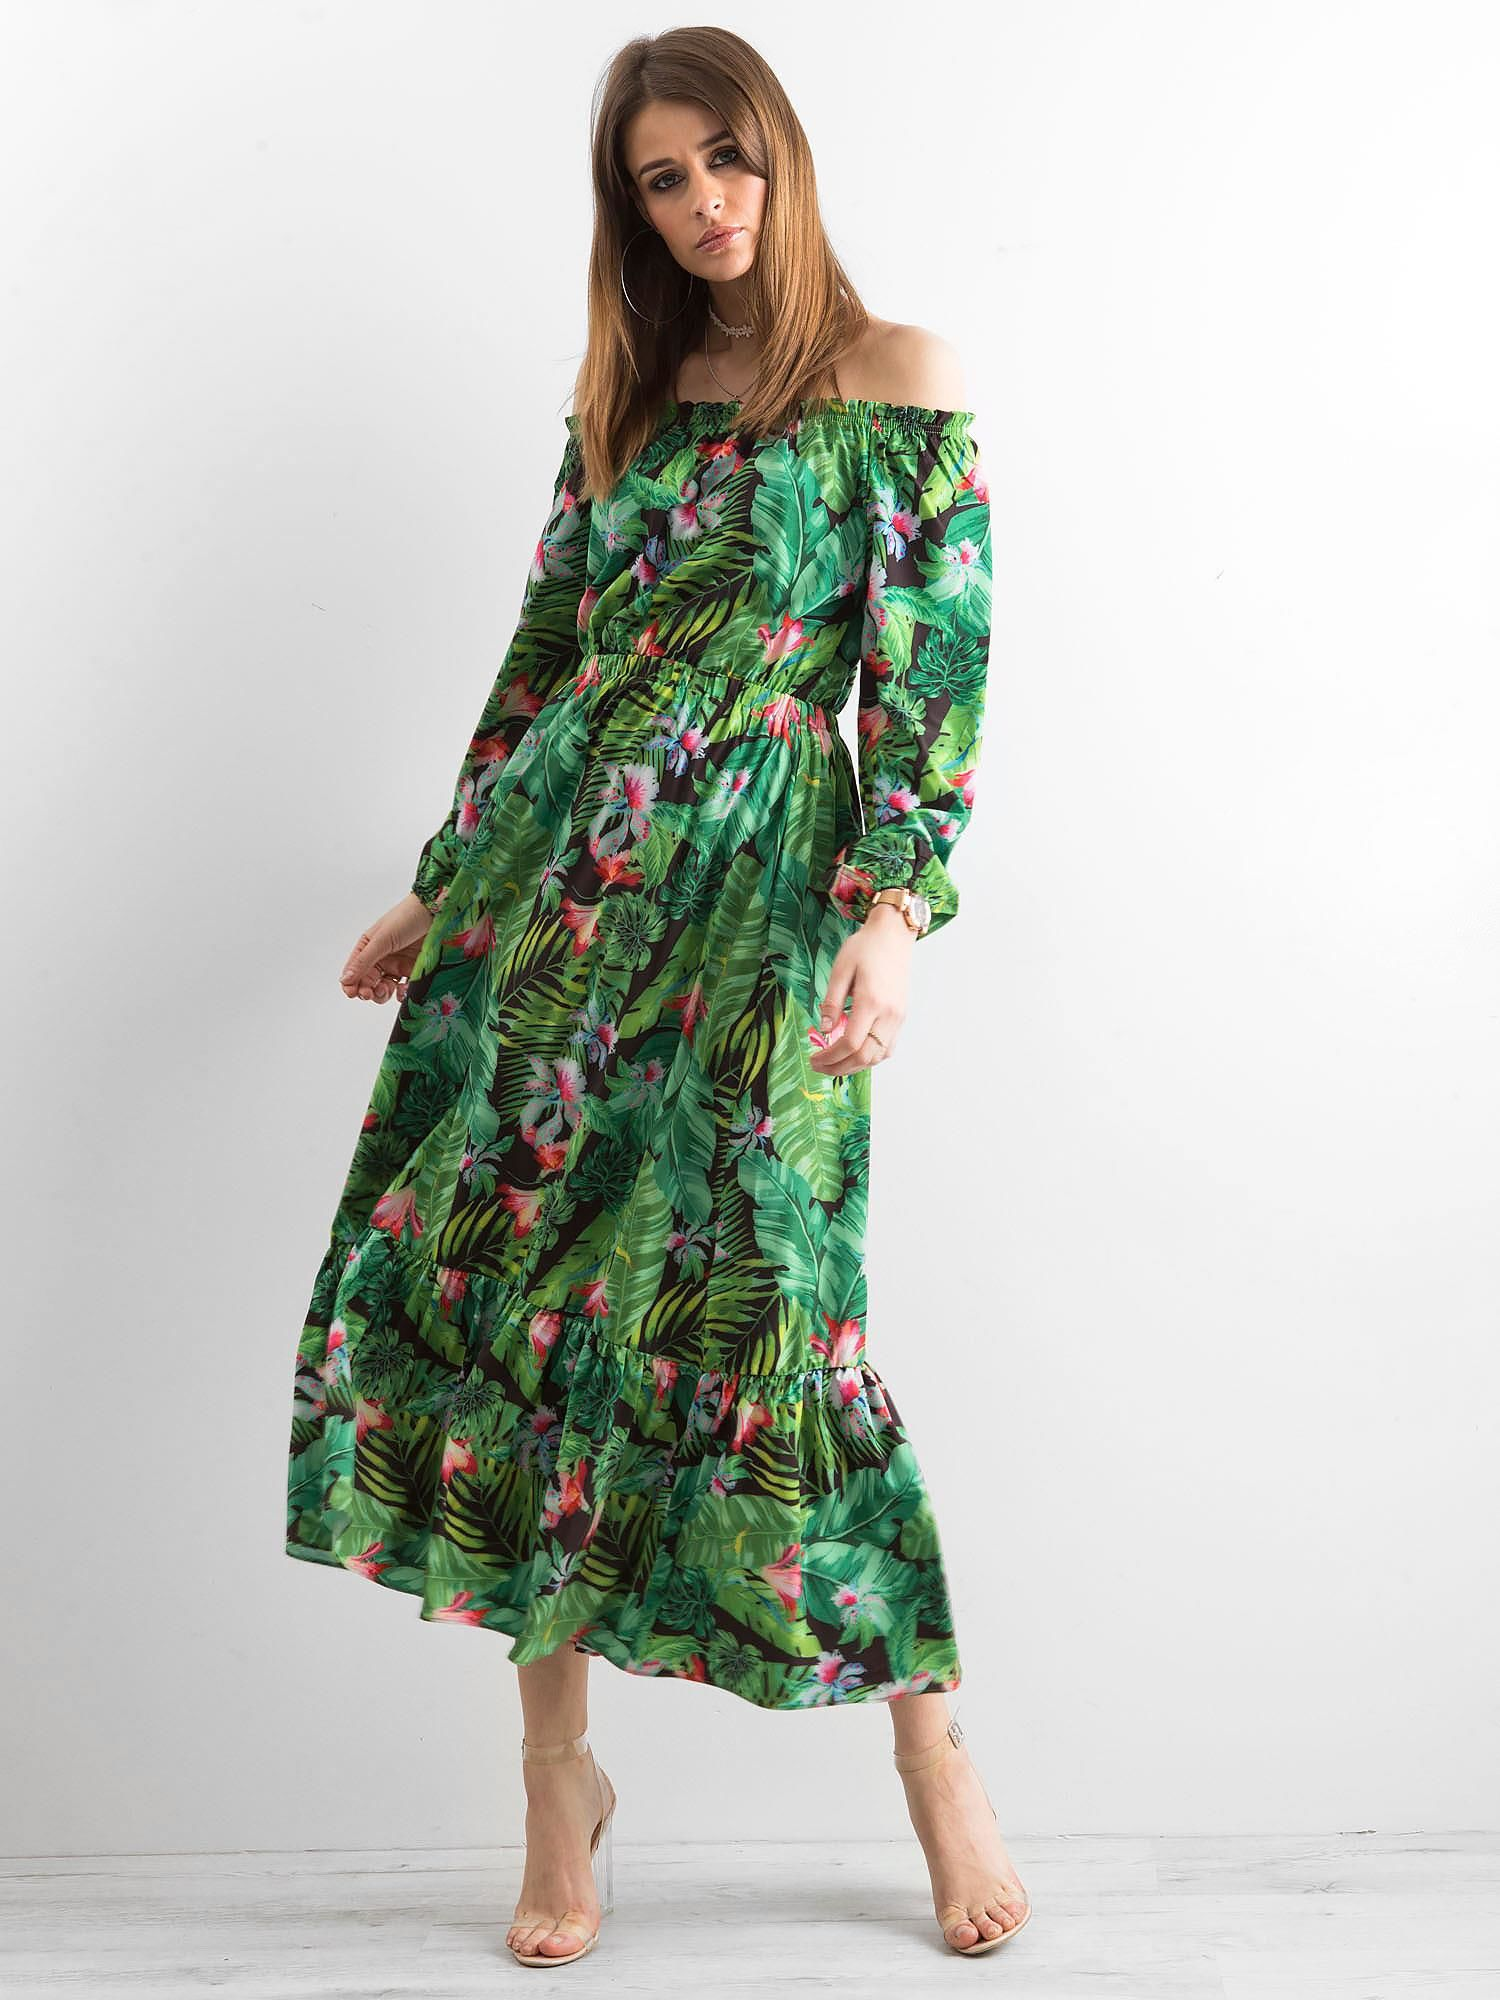 e0746190d0 Zielona sukienka z hiszpańskim dekoltem - Sukienka z printem - sklep ...